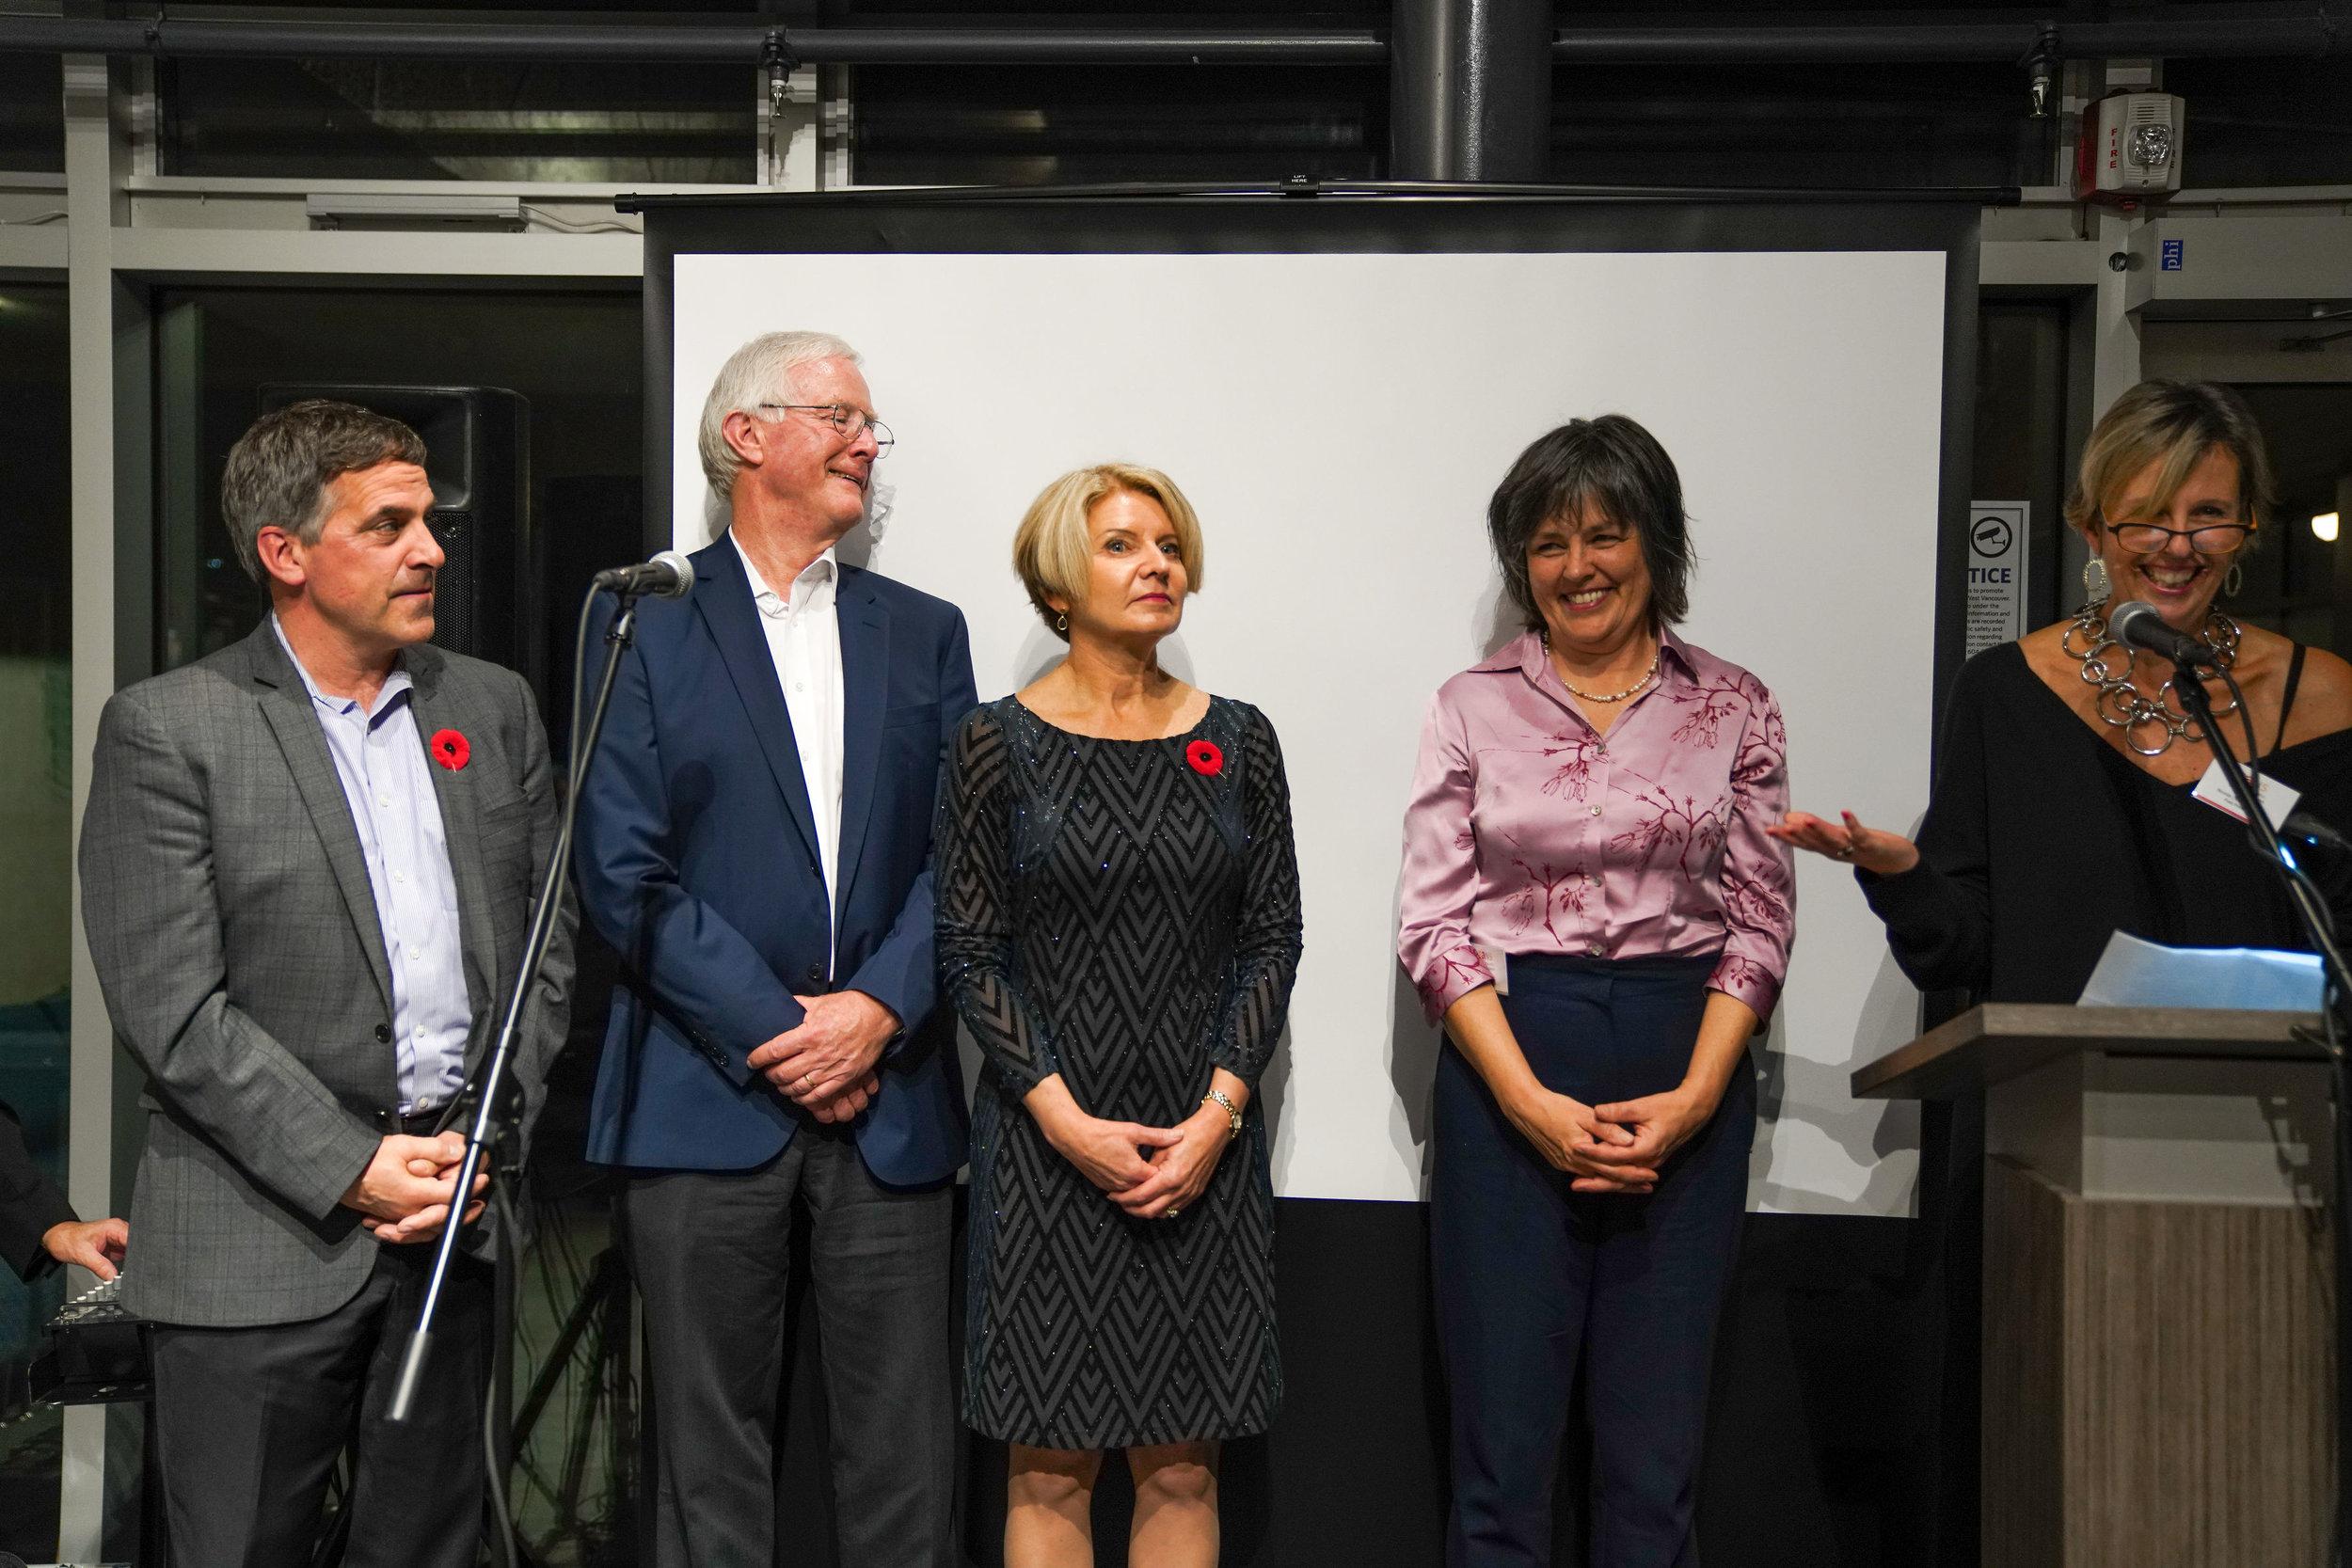 FANS Distinguished Artist Award Claudia Casper, (Literary)  LR: Mayor Mussatto, Mayor Walton, new mayor Mary-Ann Booth, Claudia Casper, and Nicky Morgan FANS Director